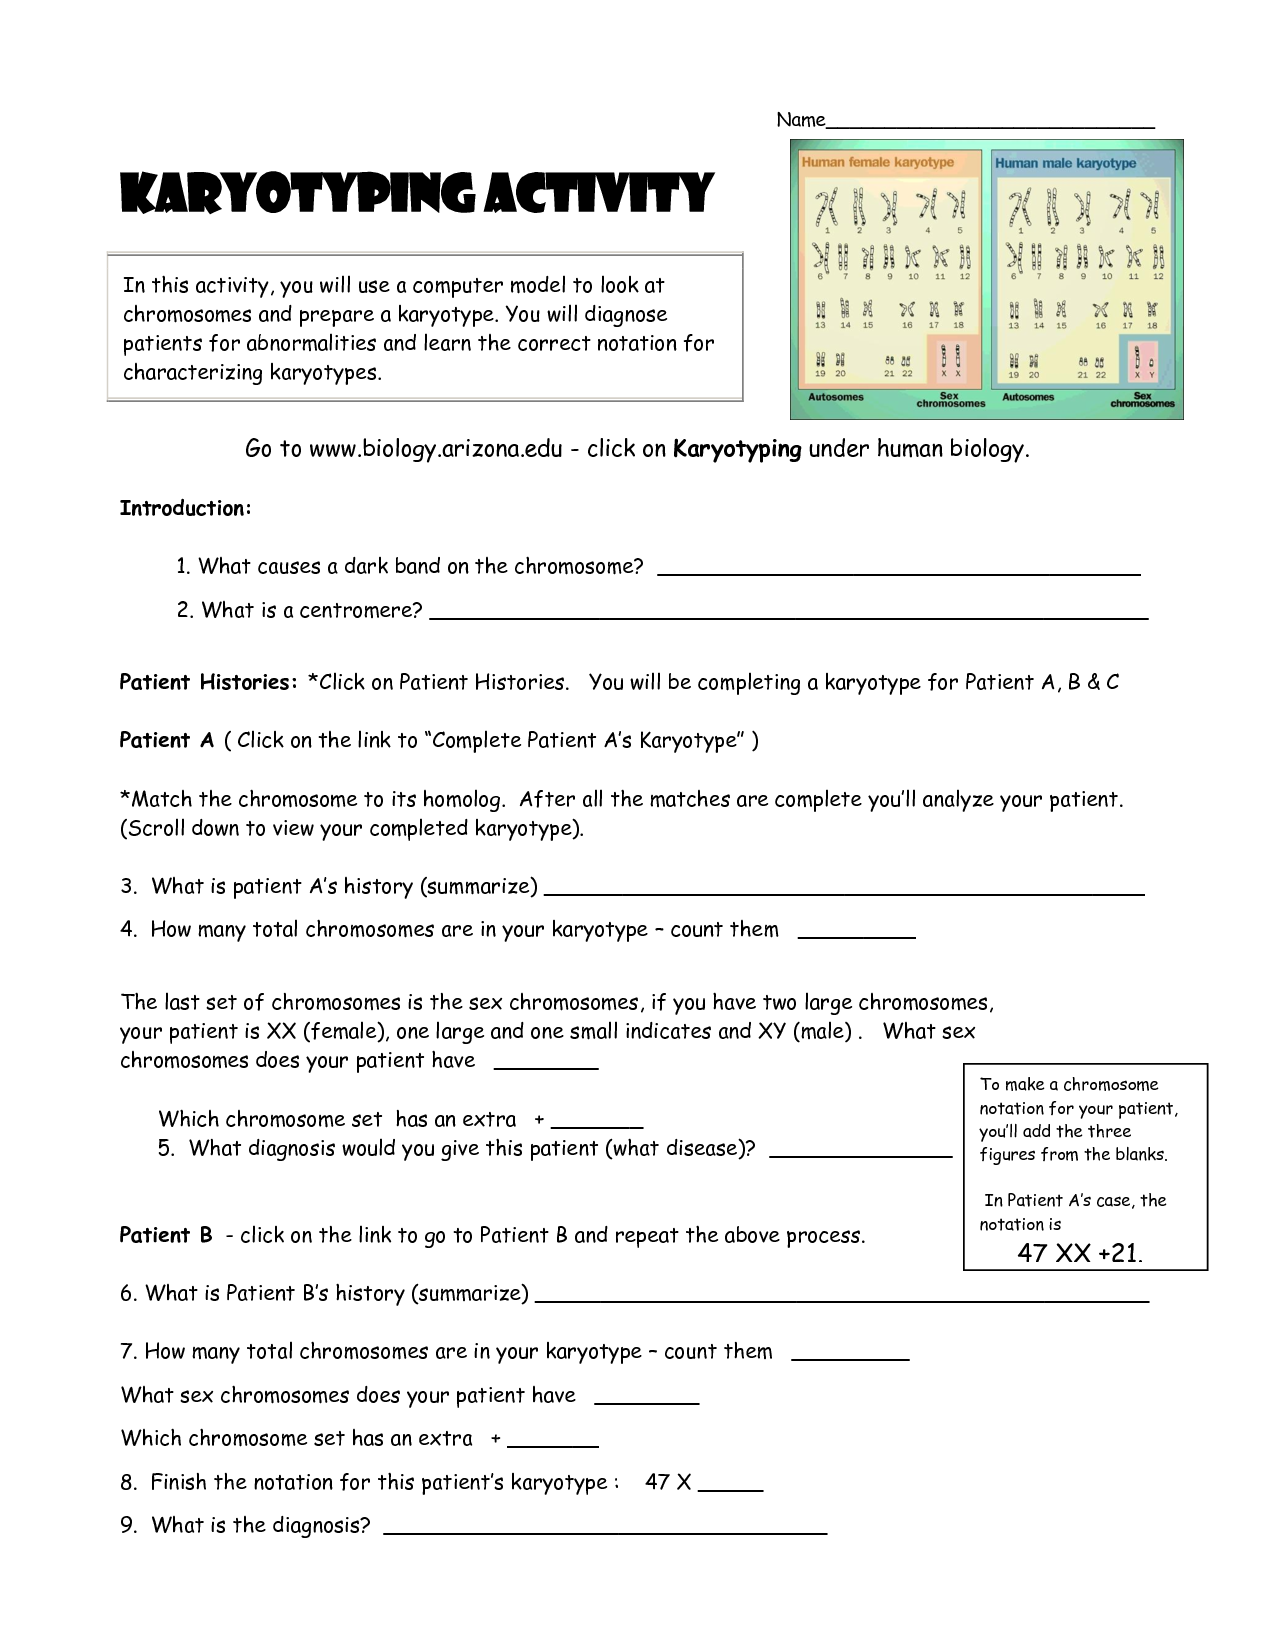 Karyotyping Activity Doc